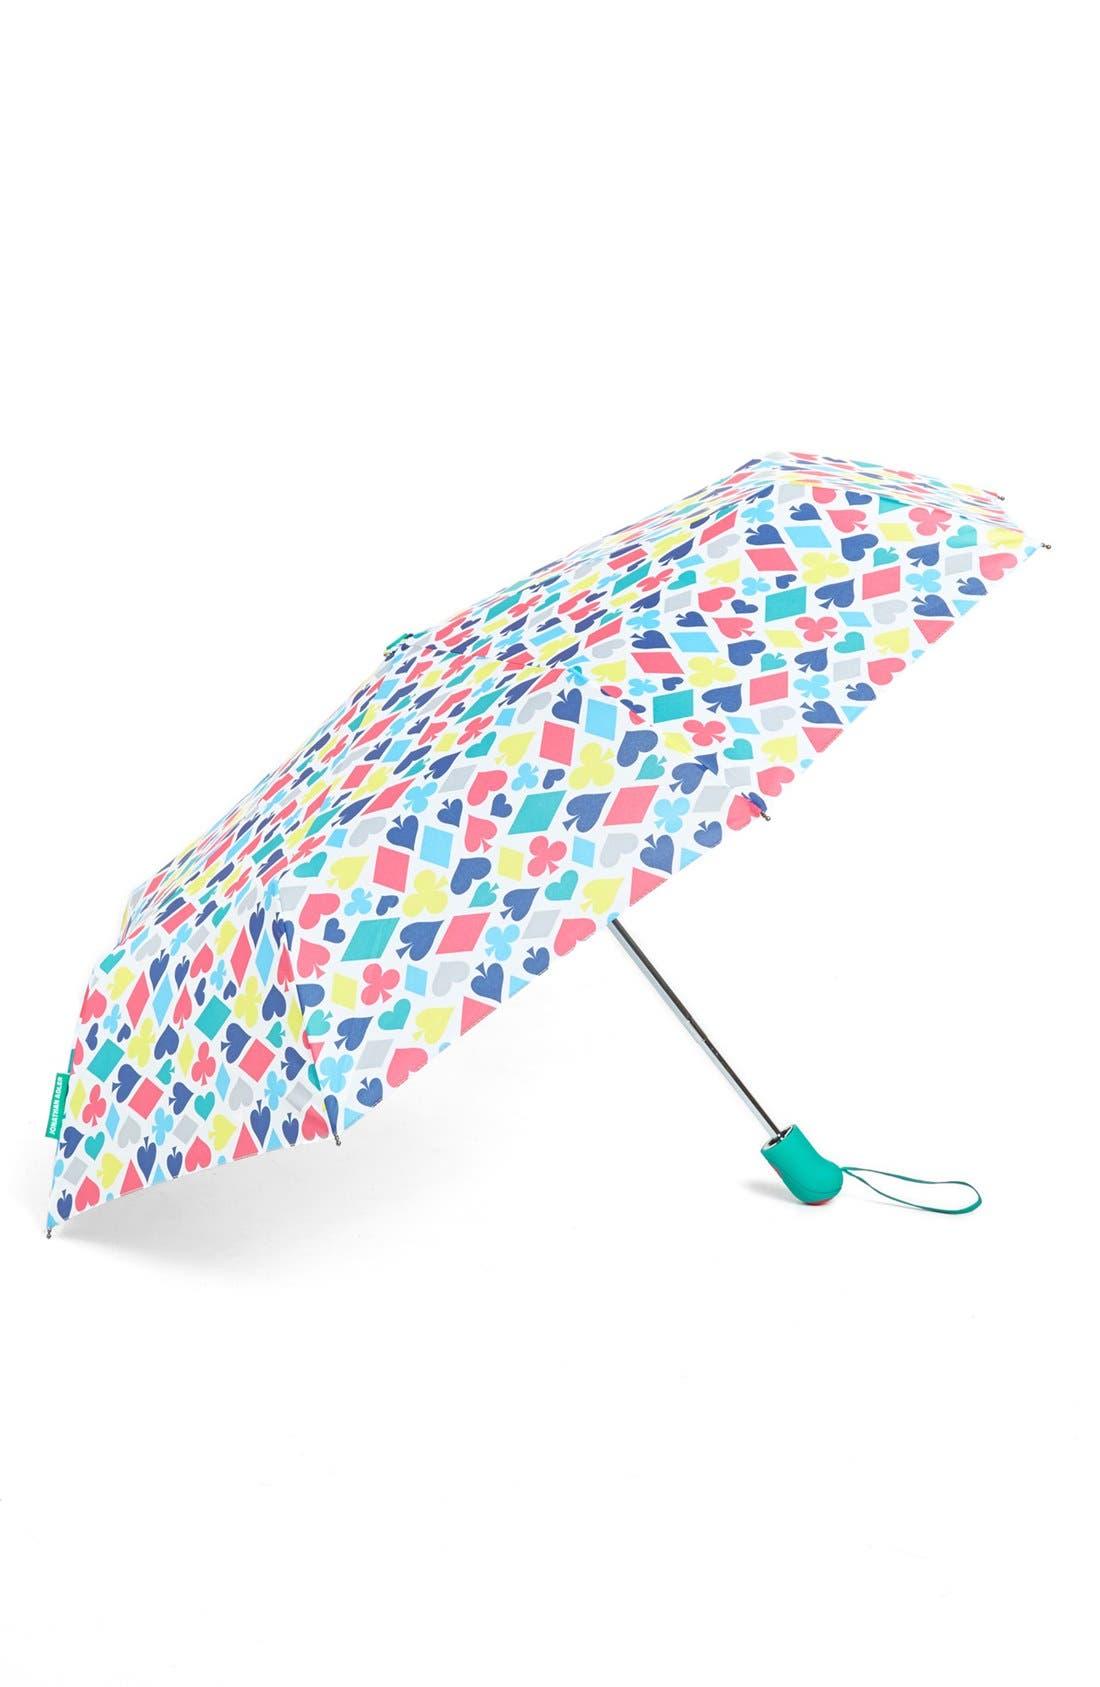 'House of Cards' Umbrella,                         Main,                         color, 100